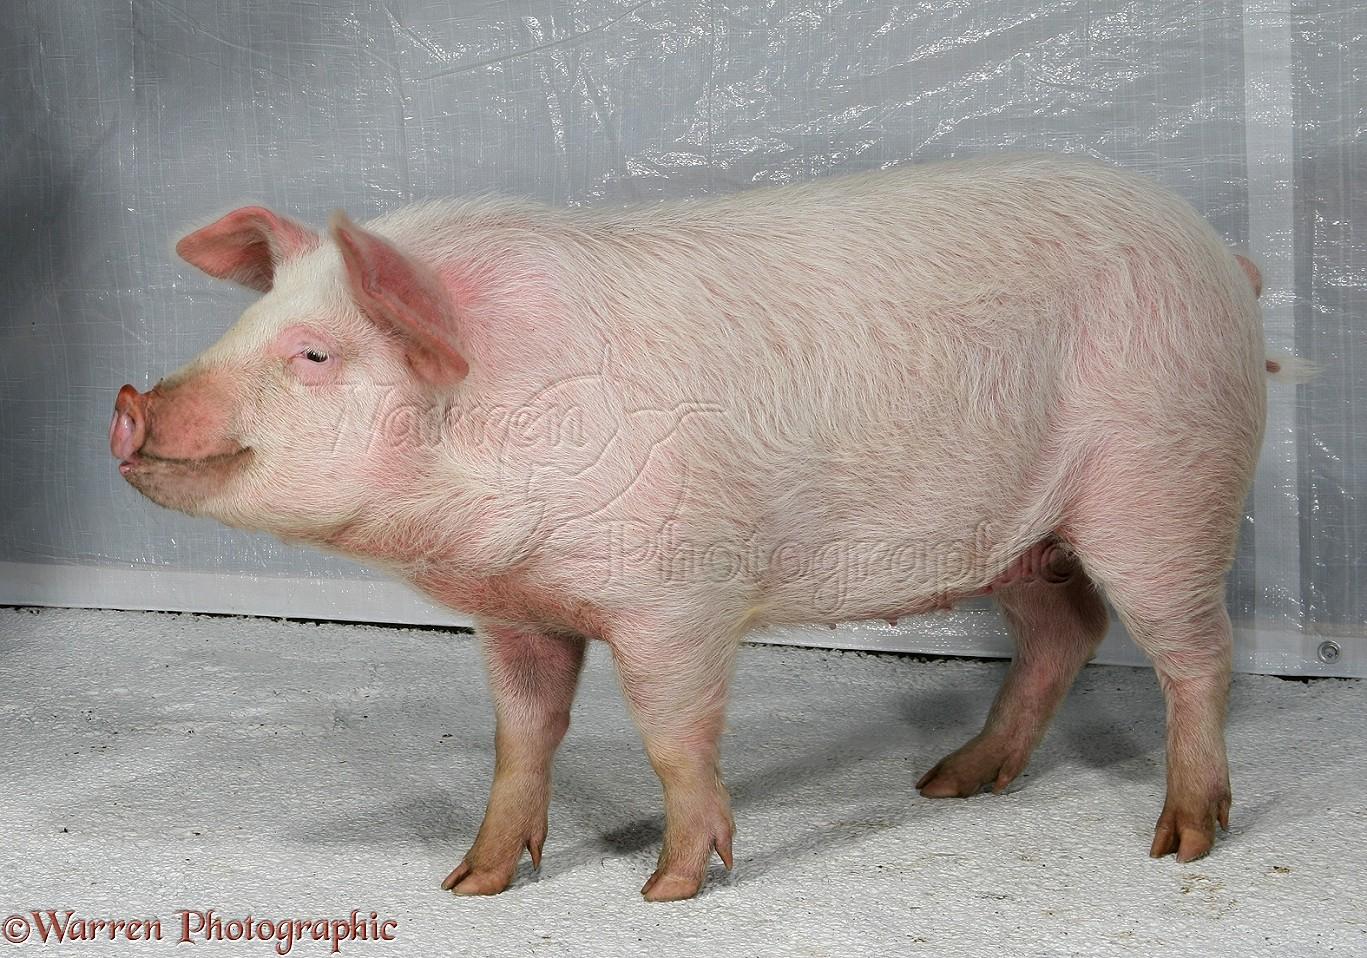 Pink piglets - photo#21